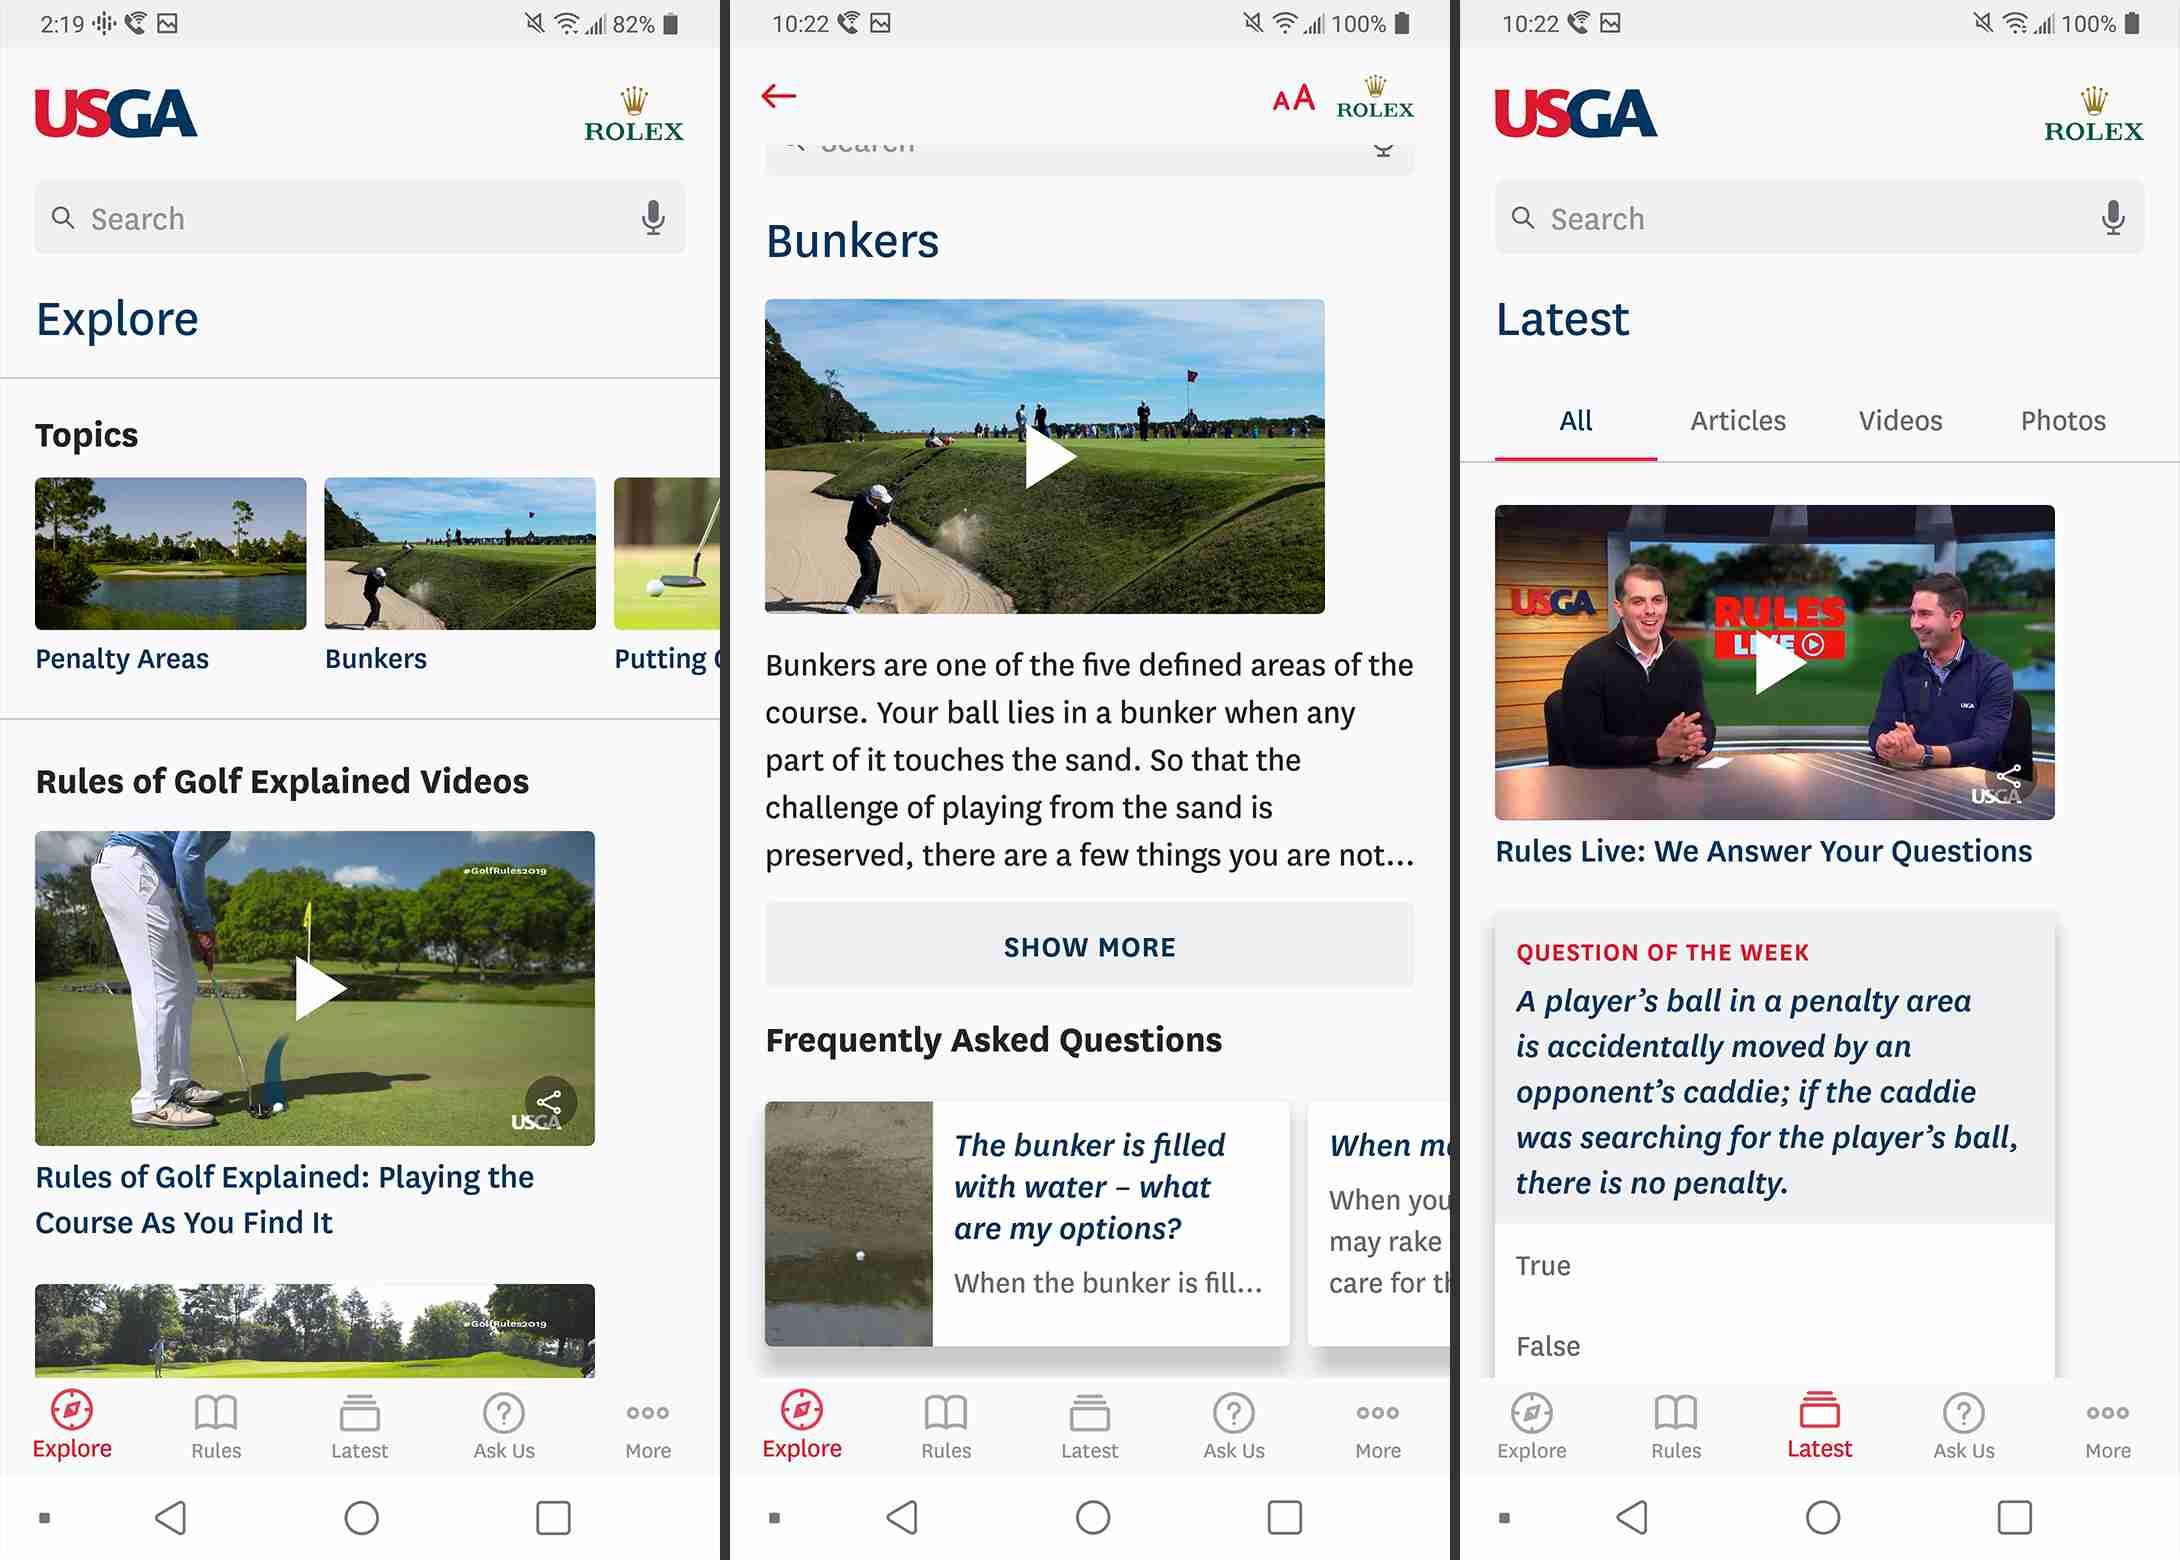 Rules of Golf app screenshots